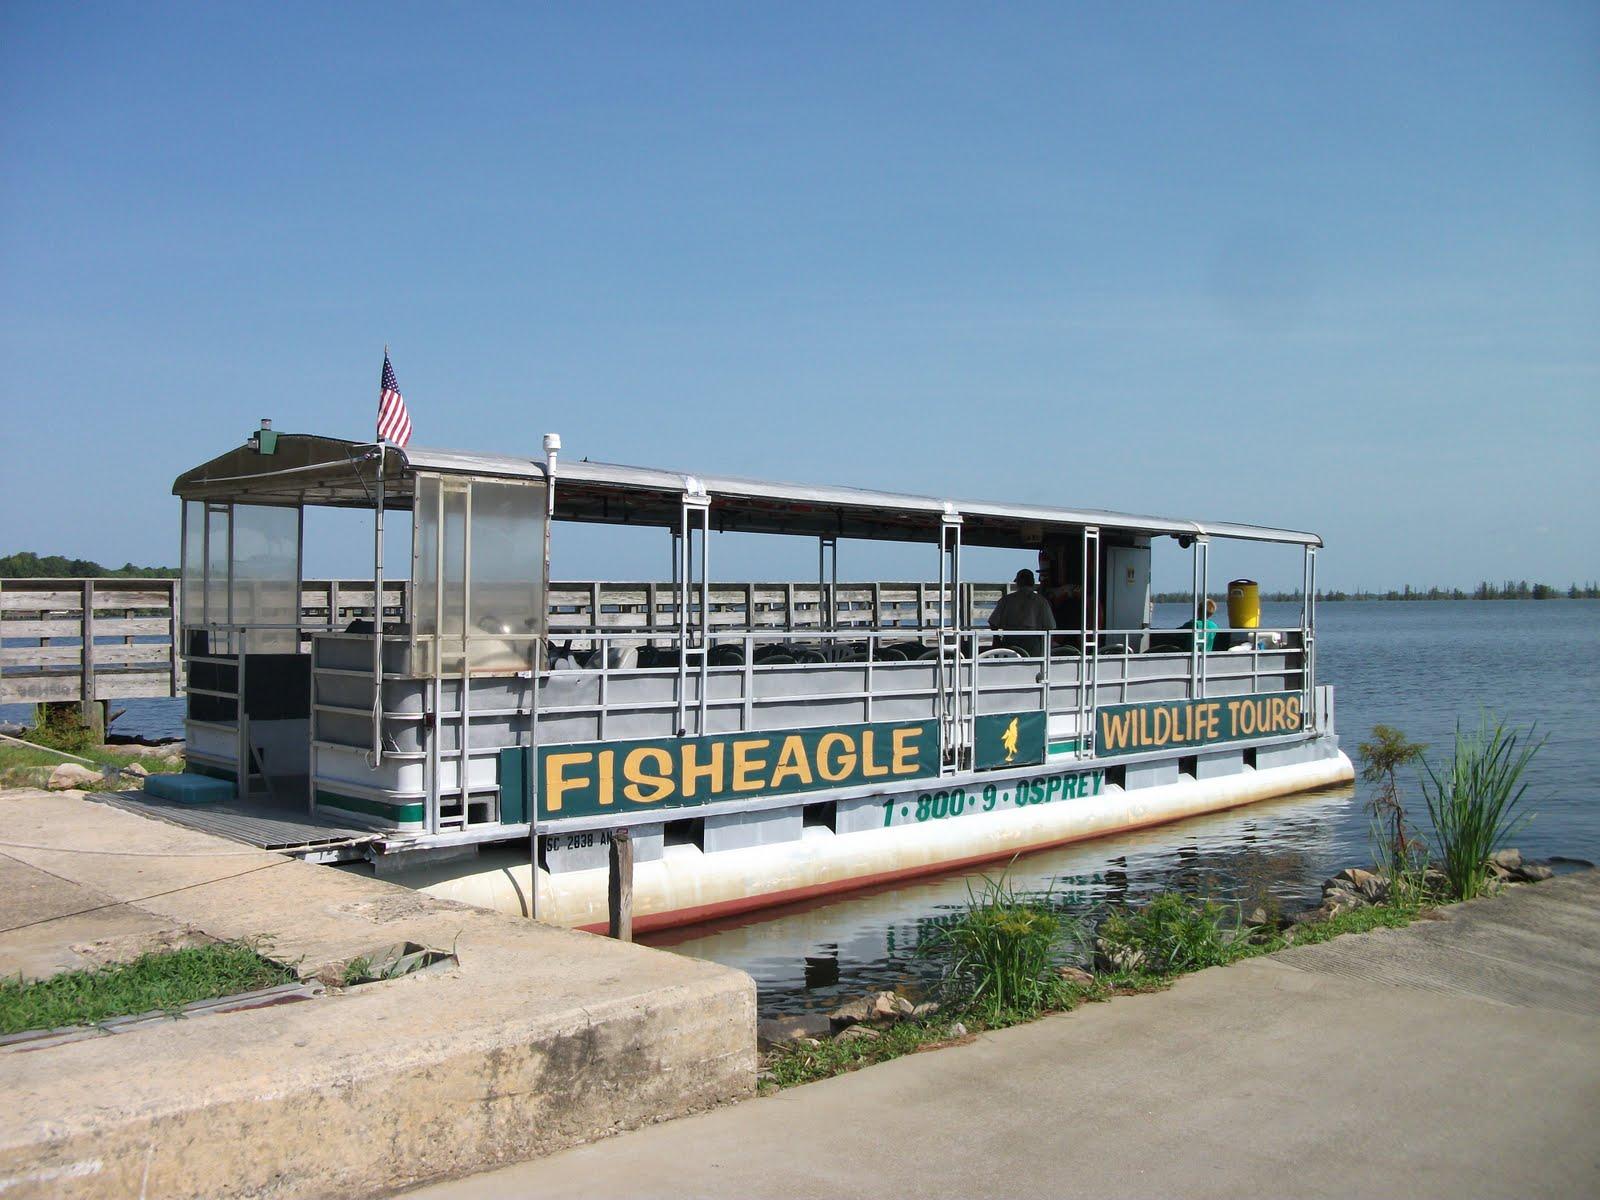 FishEagle Boat Tour